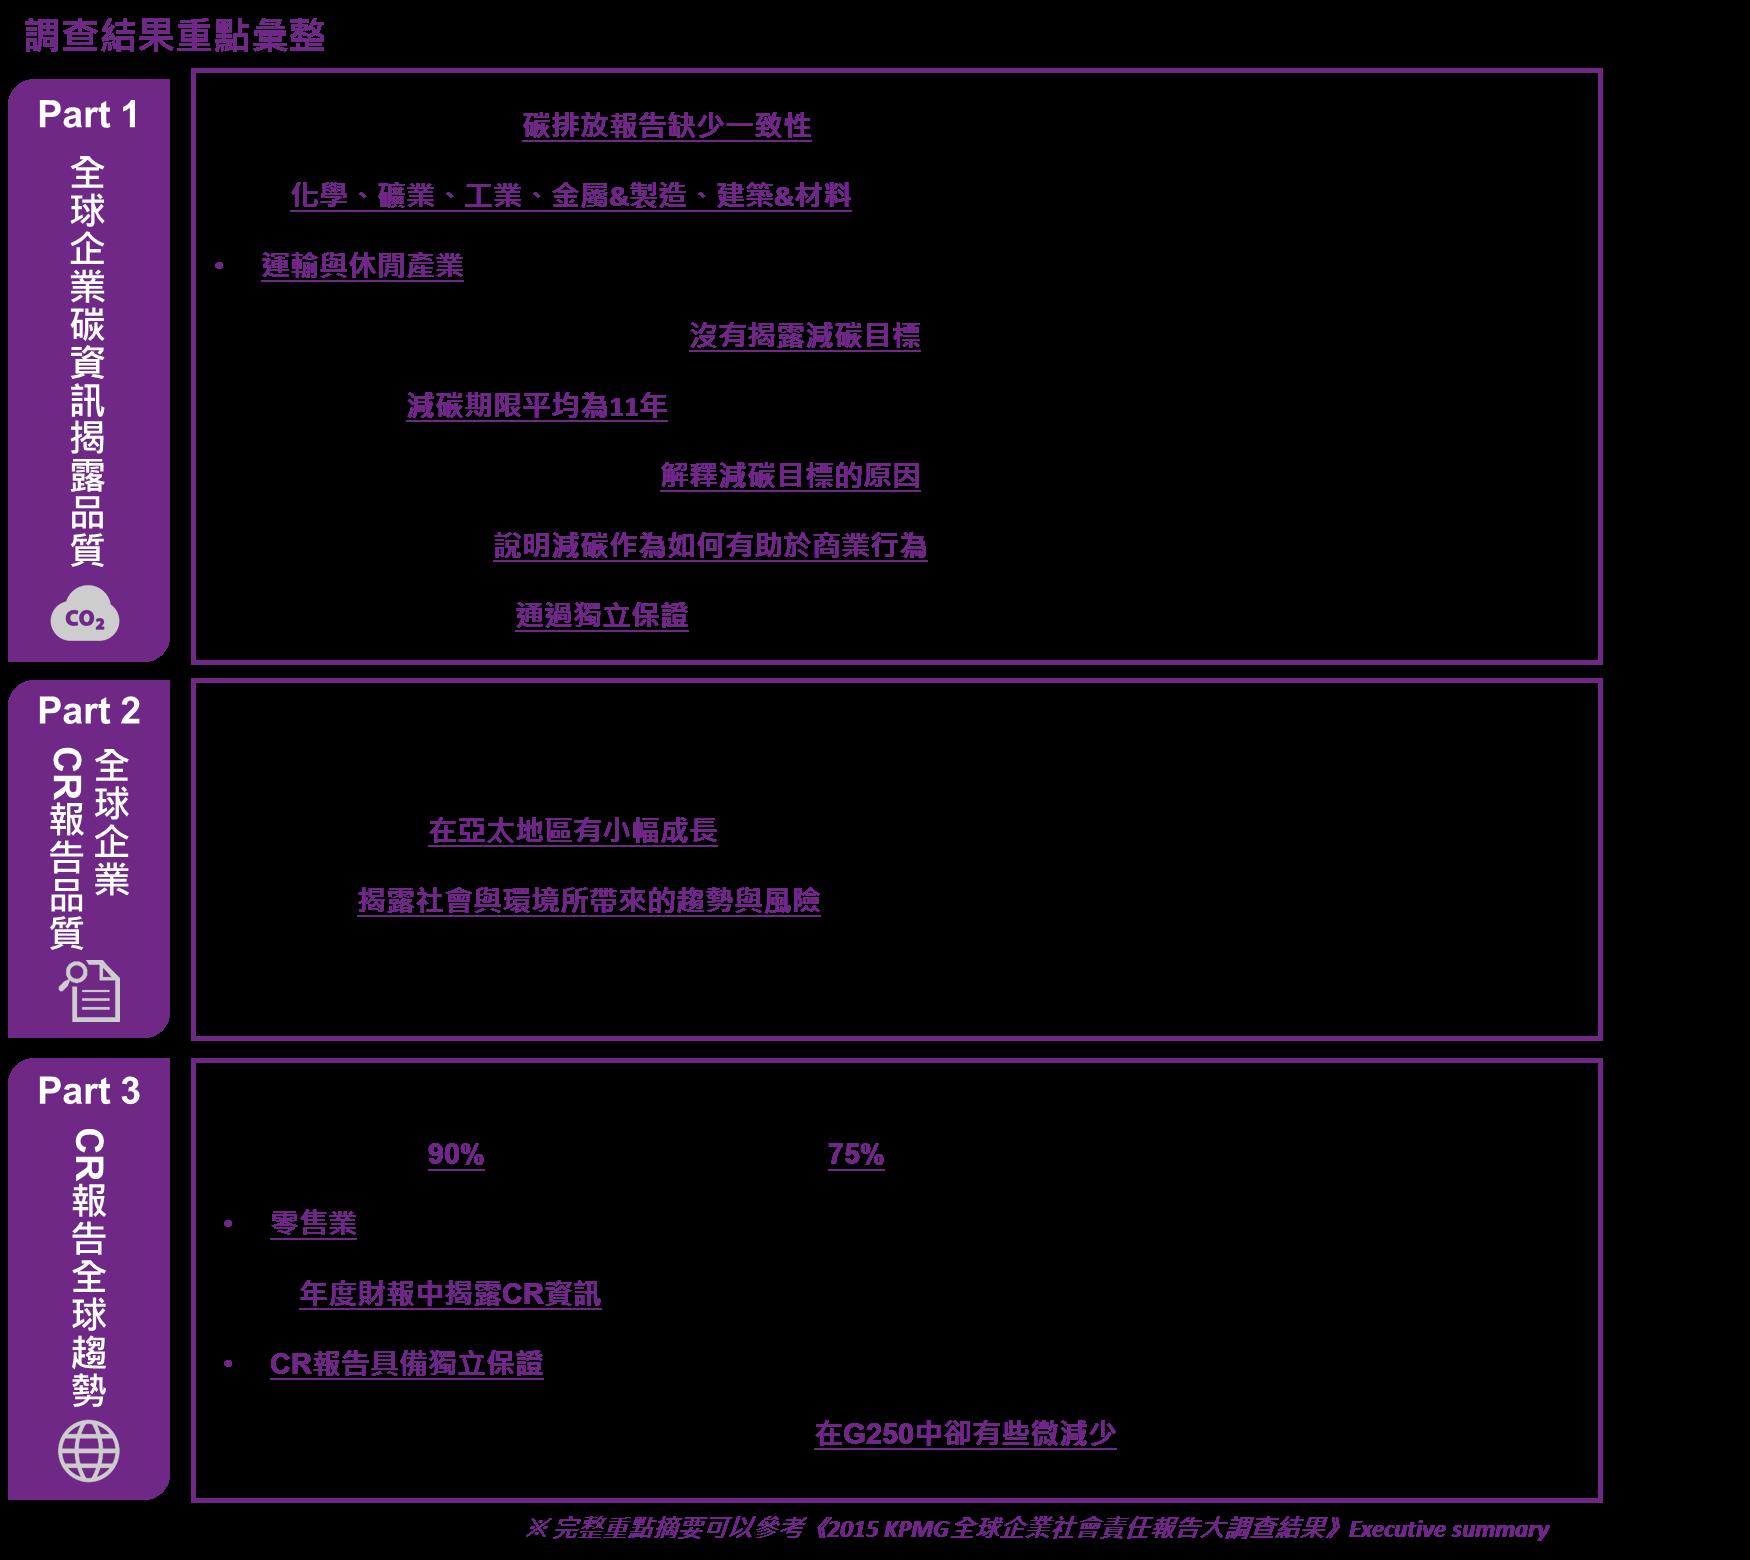 KPMG 2015 CR survey  - Summery重點整理 - CSRone